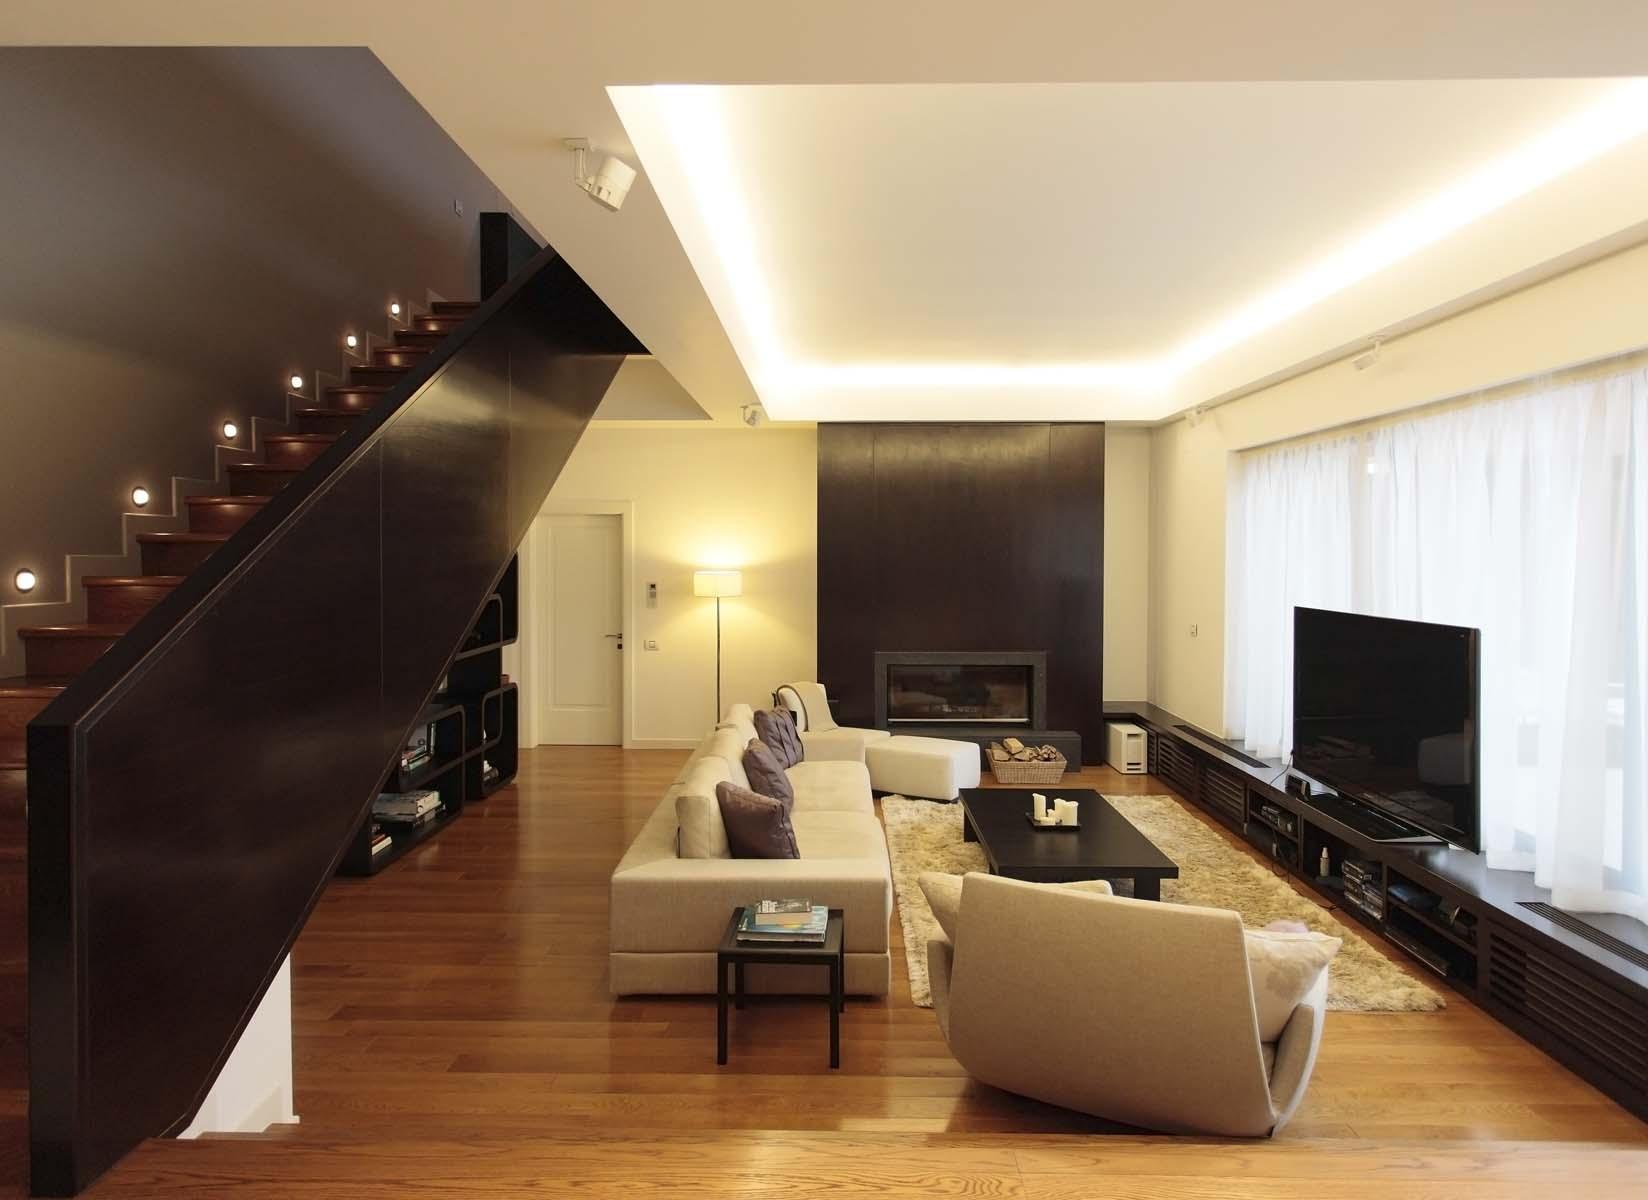 https://nbc-arhitect.ro/wp-content/uploads/2020/11/NBC-ARHITECT-_-residential-_-Tudor-House-_-Romania_6.jpg